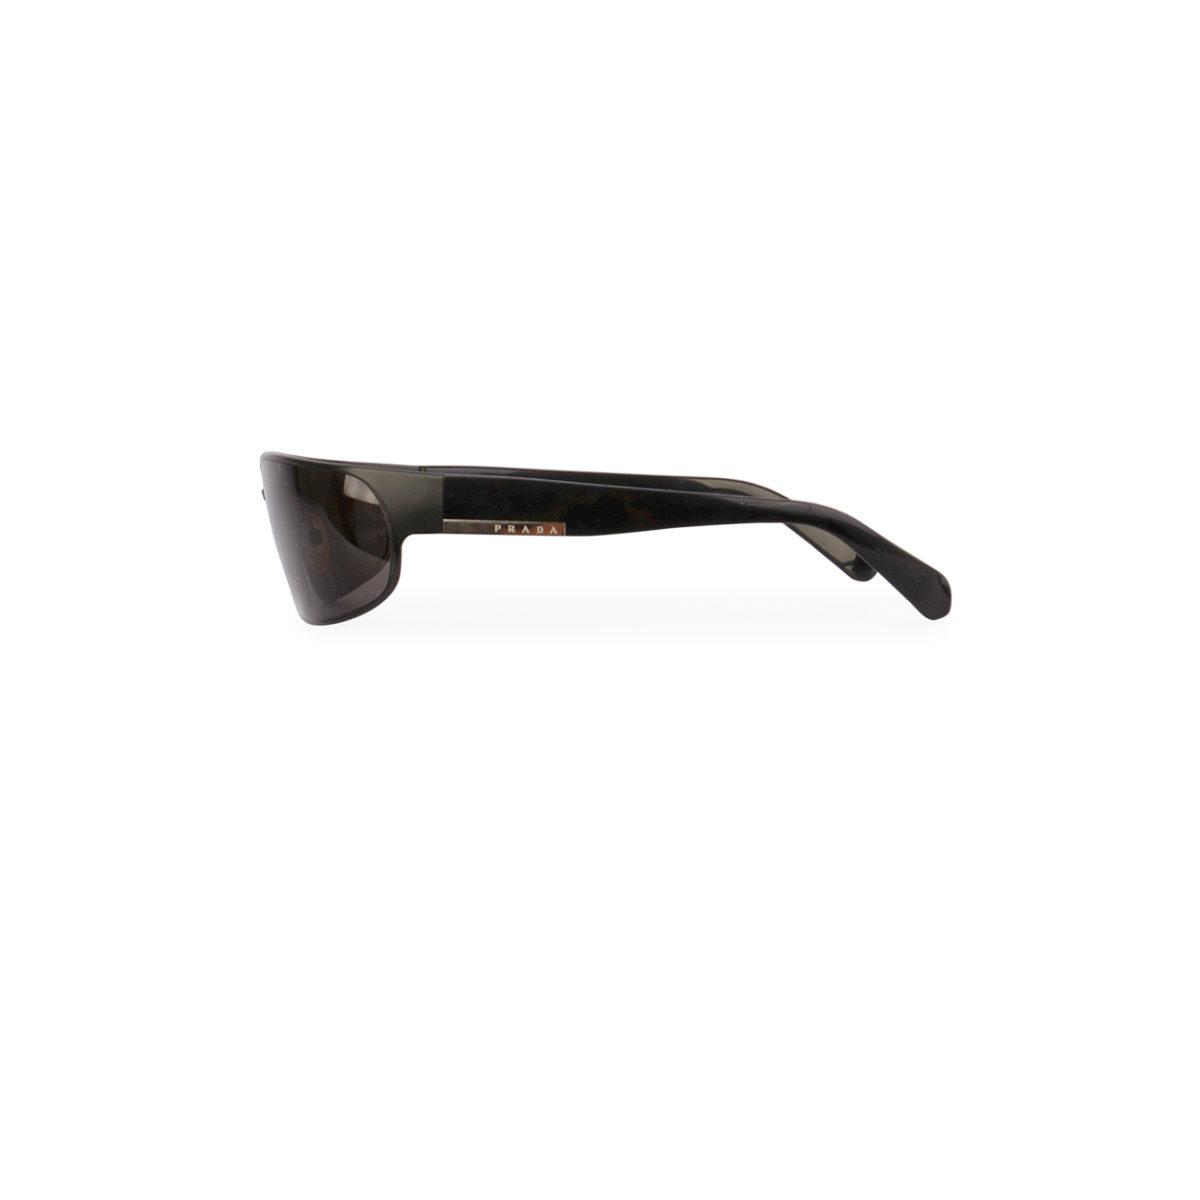 863d951891dc4 PRADA Sunglasses SPR 53F Black